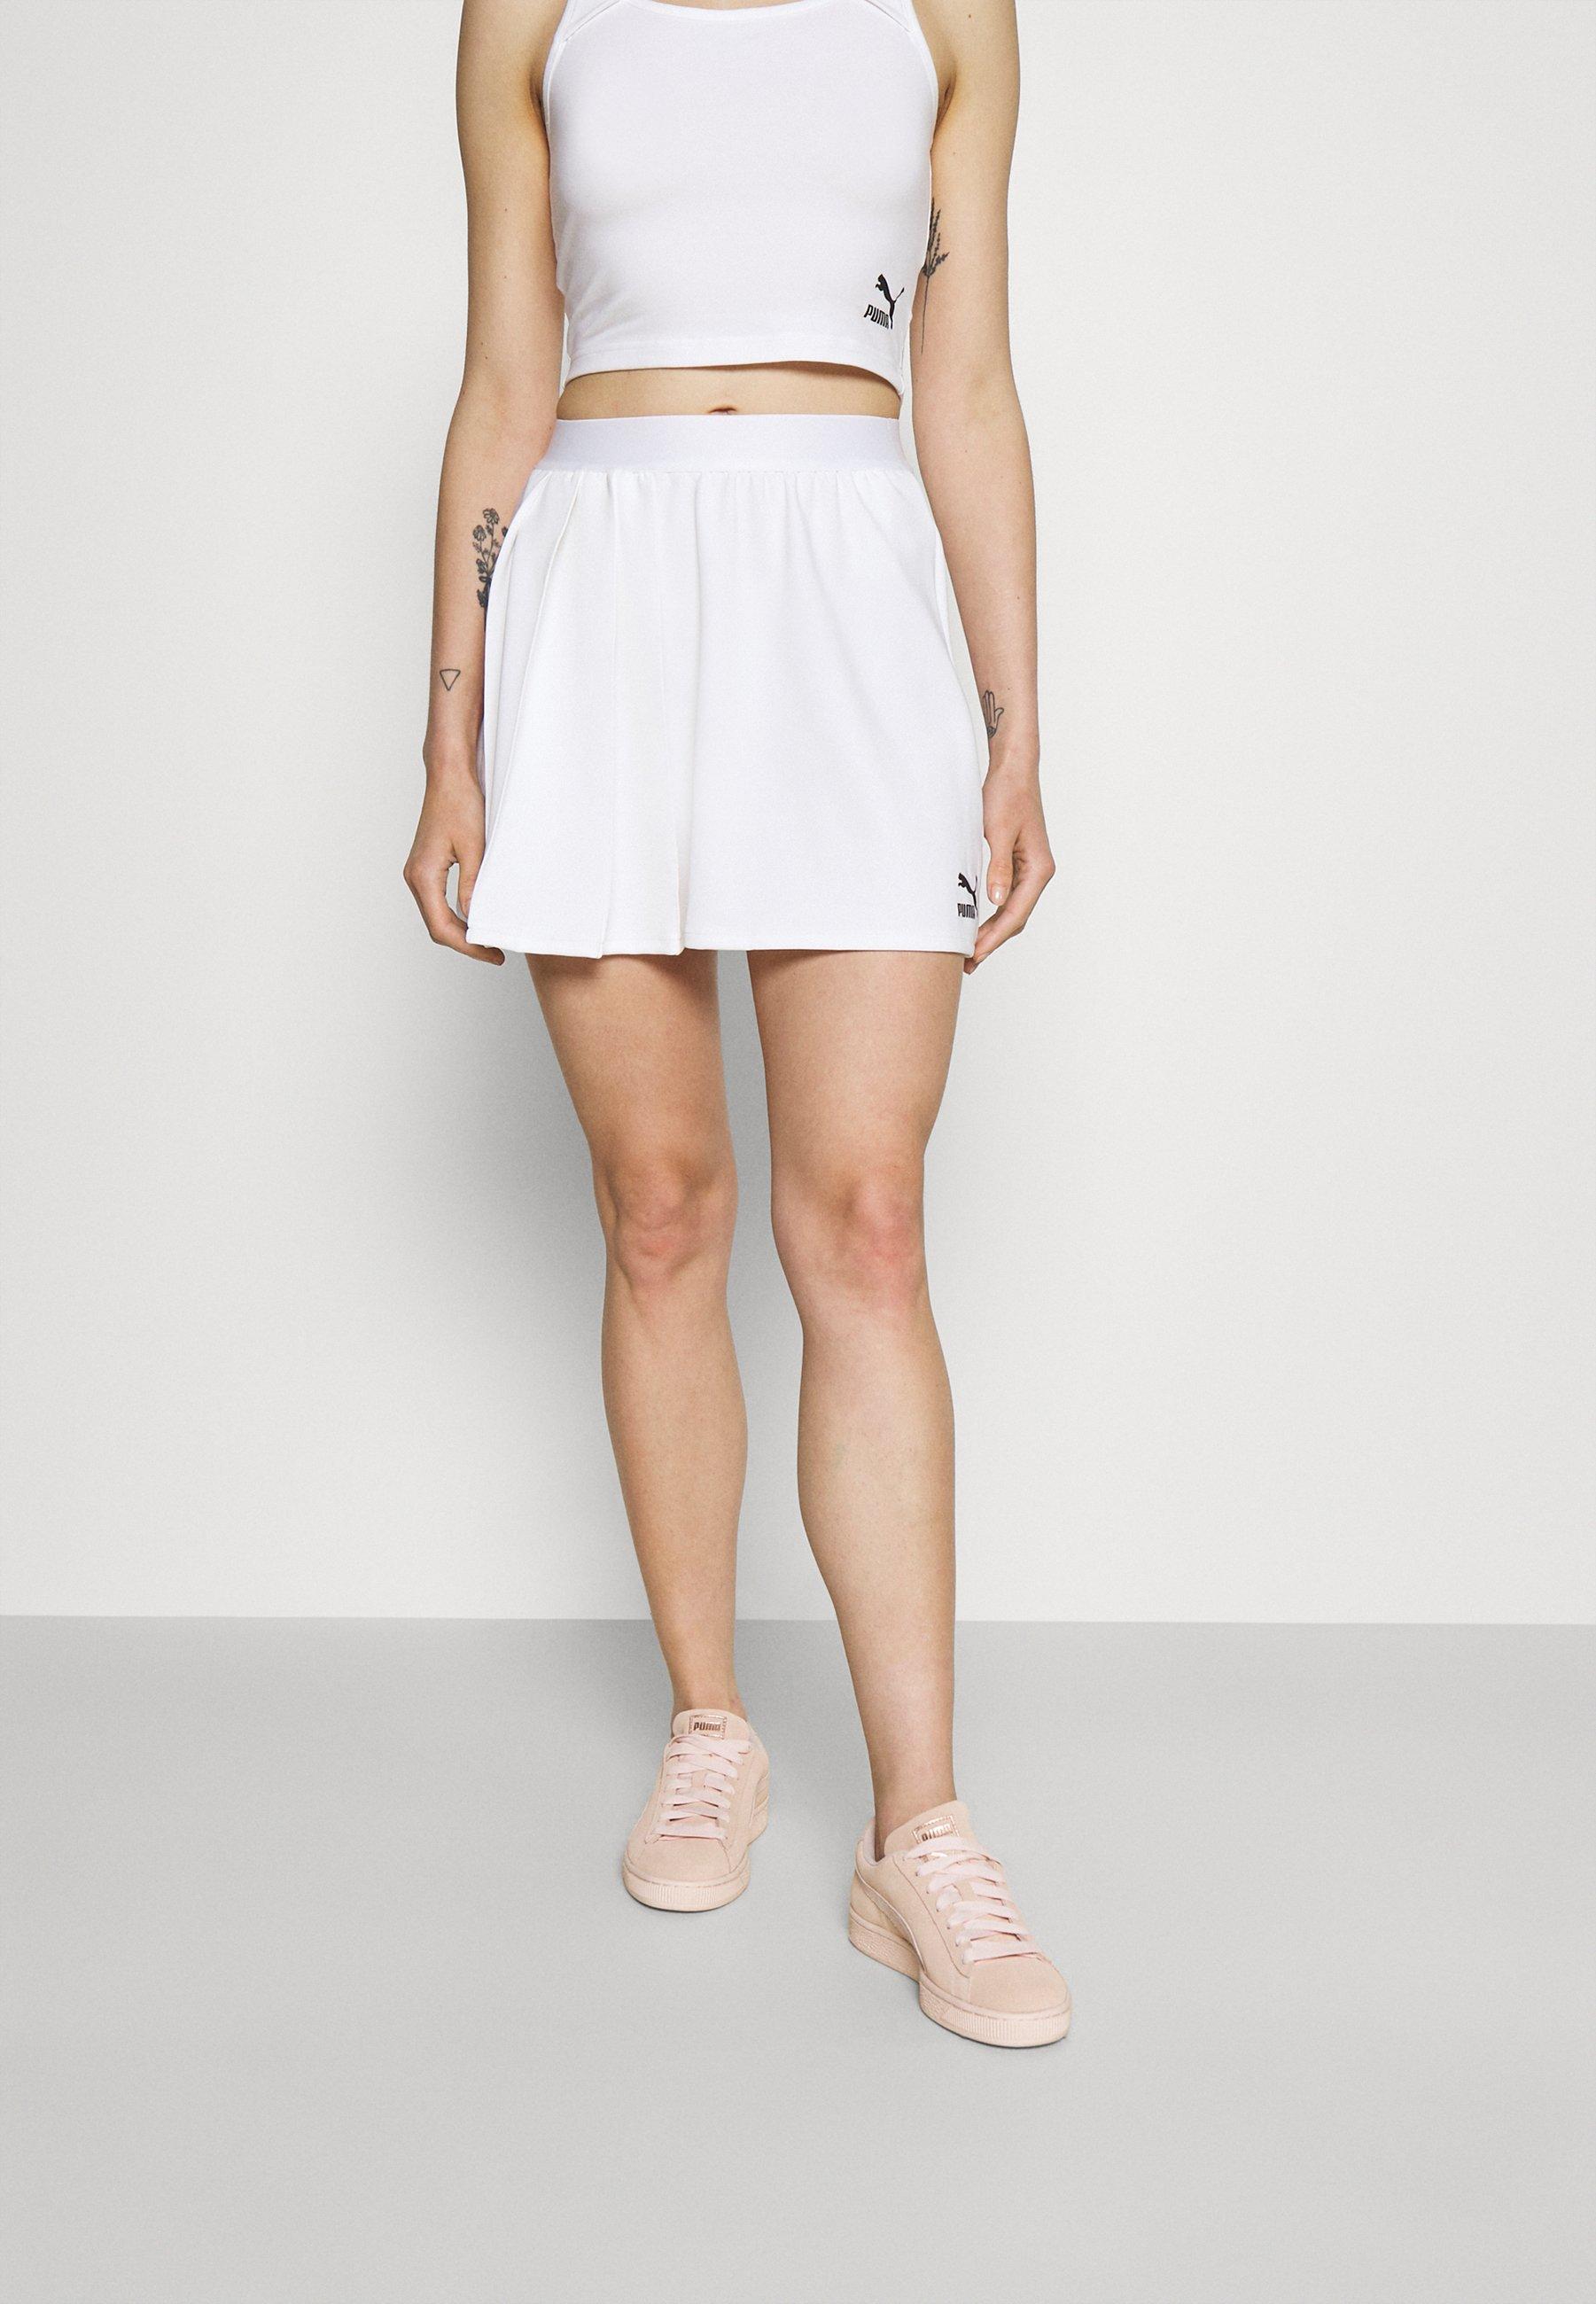 Femme CLASSICS ASYMMETRIC SKIRT - Minijupe